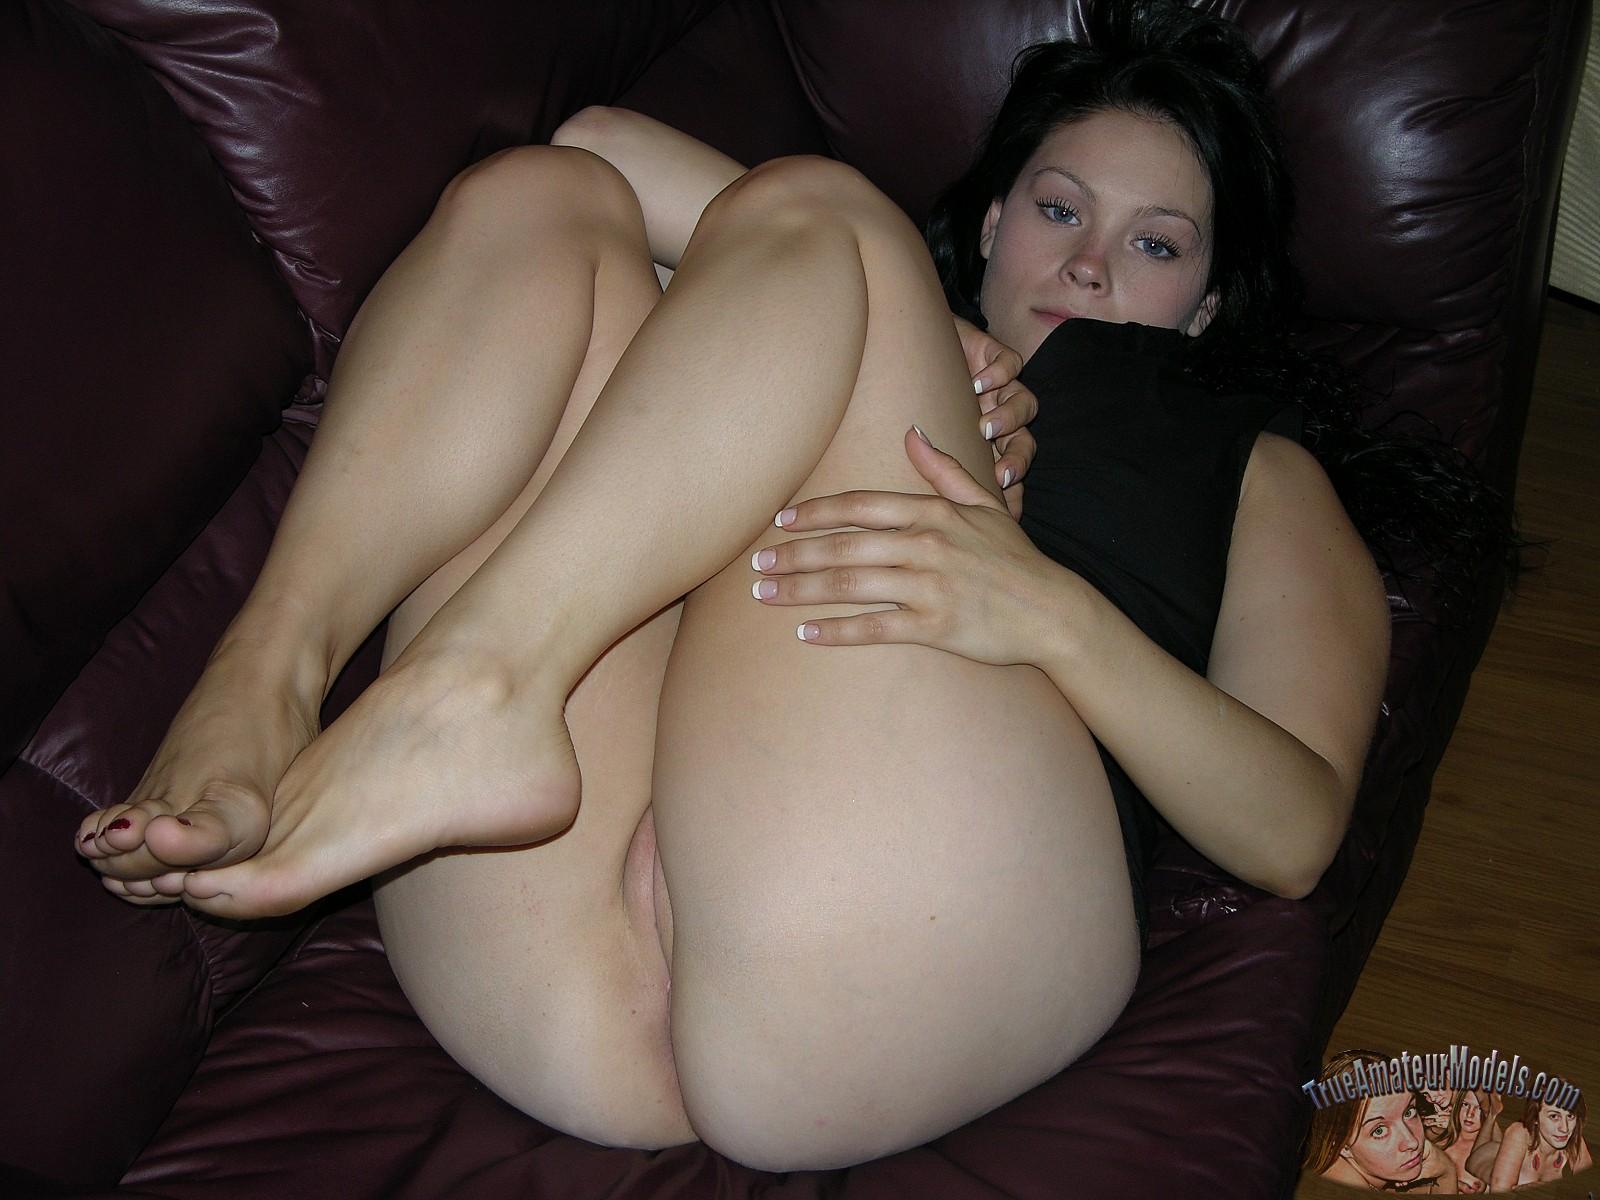 big tits and curvy ass amateurs